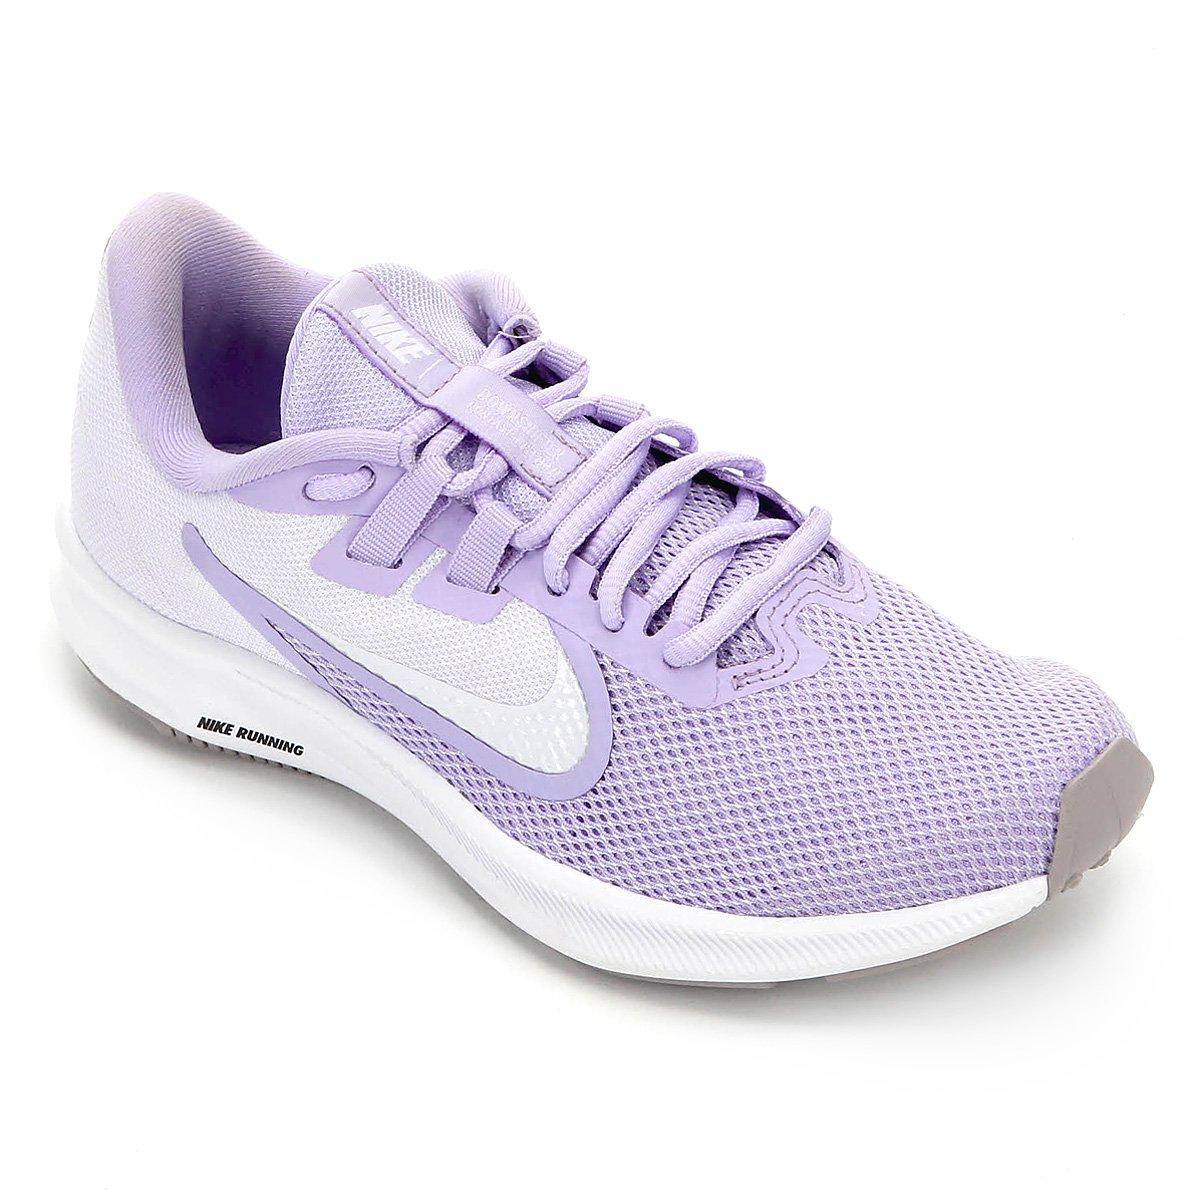 Tênis Nike Downshifter 9 Feminino Roxo E Branco